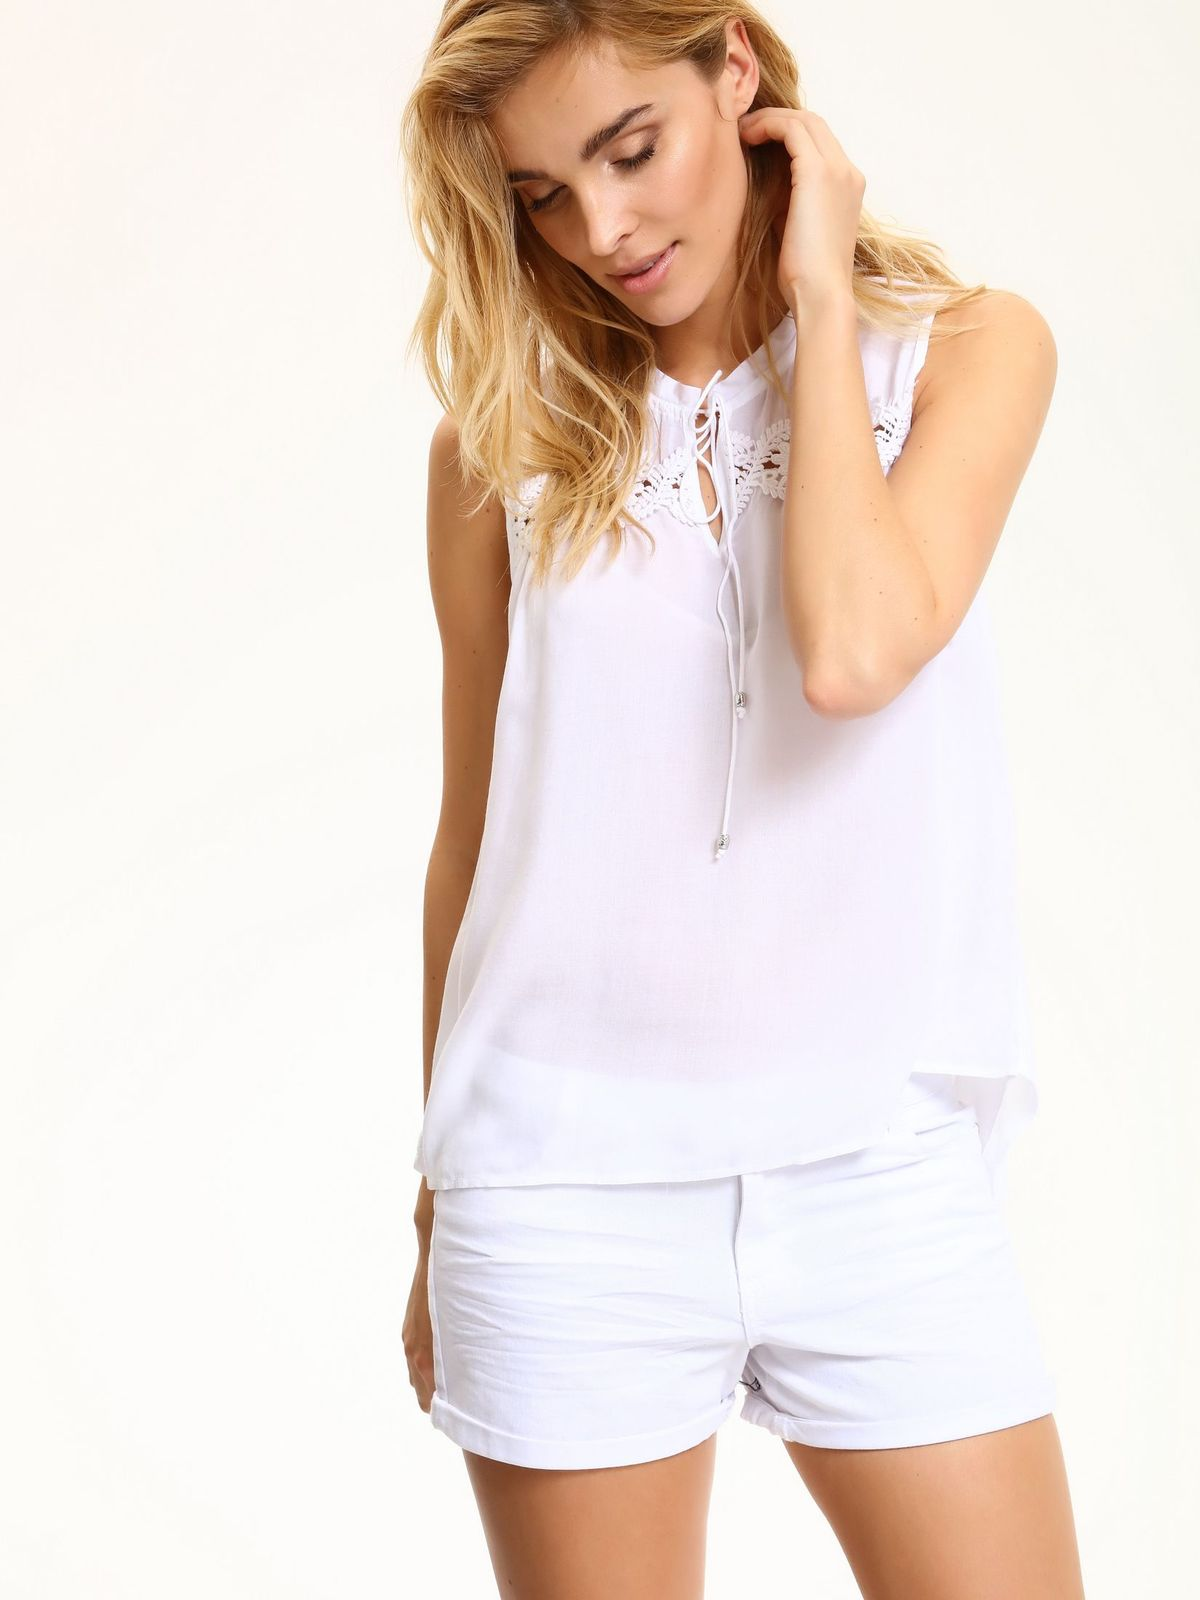 e1fa7e64ad61 Γυναικεία   Ρούχα   Μπλούζες   Tops   TOP SECRET top secret ...